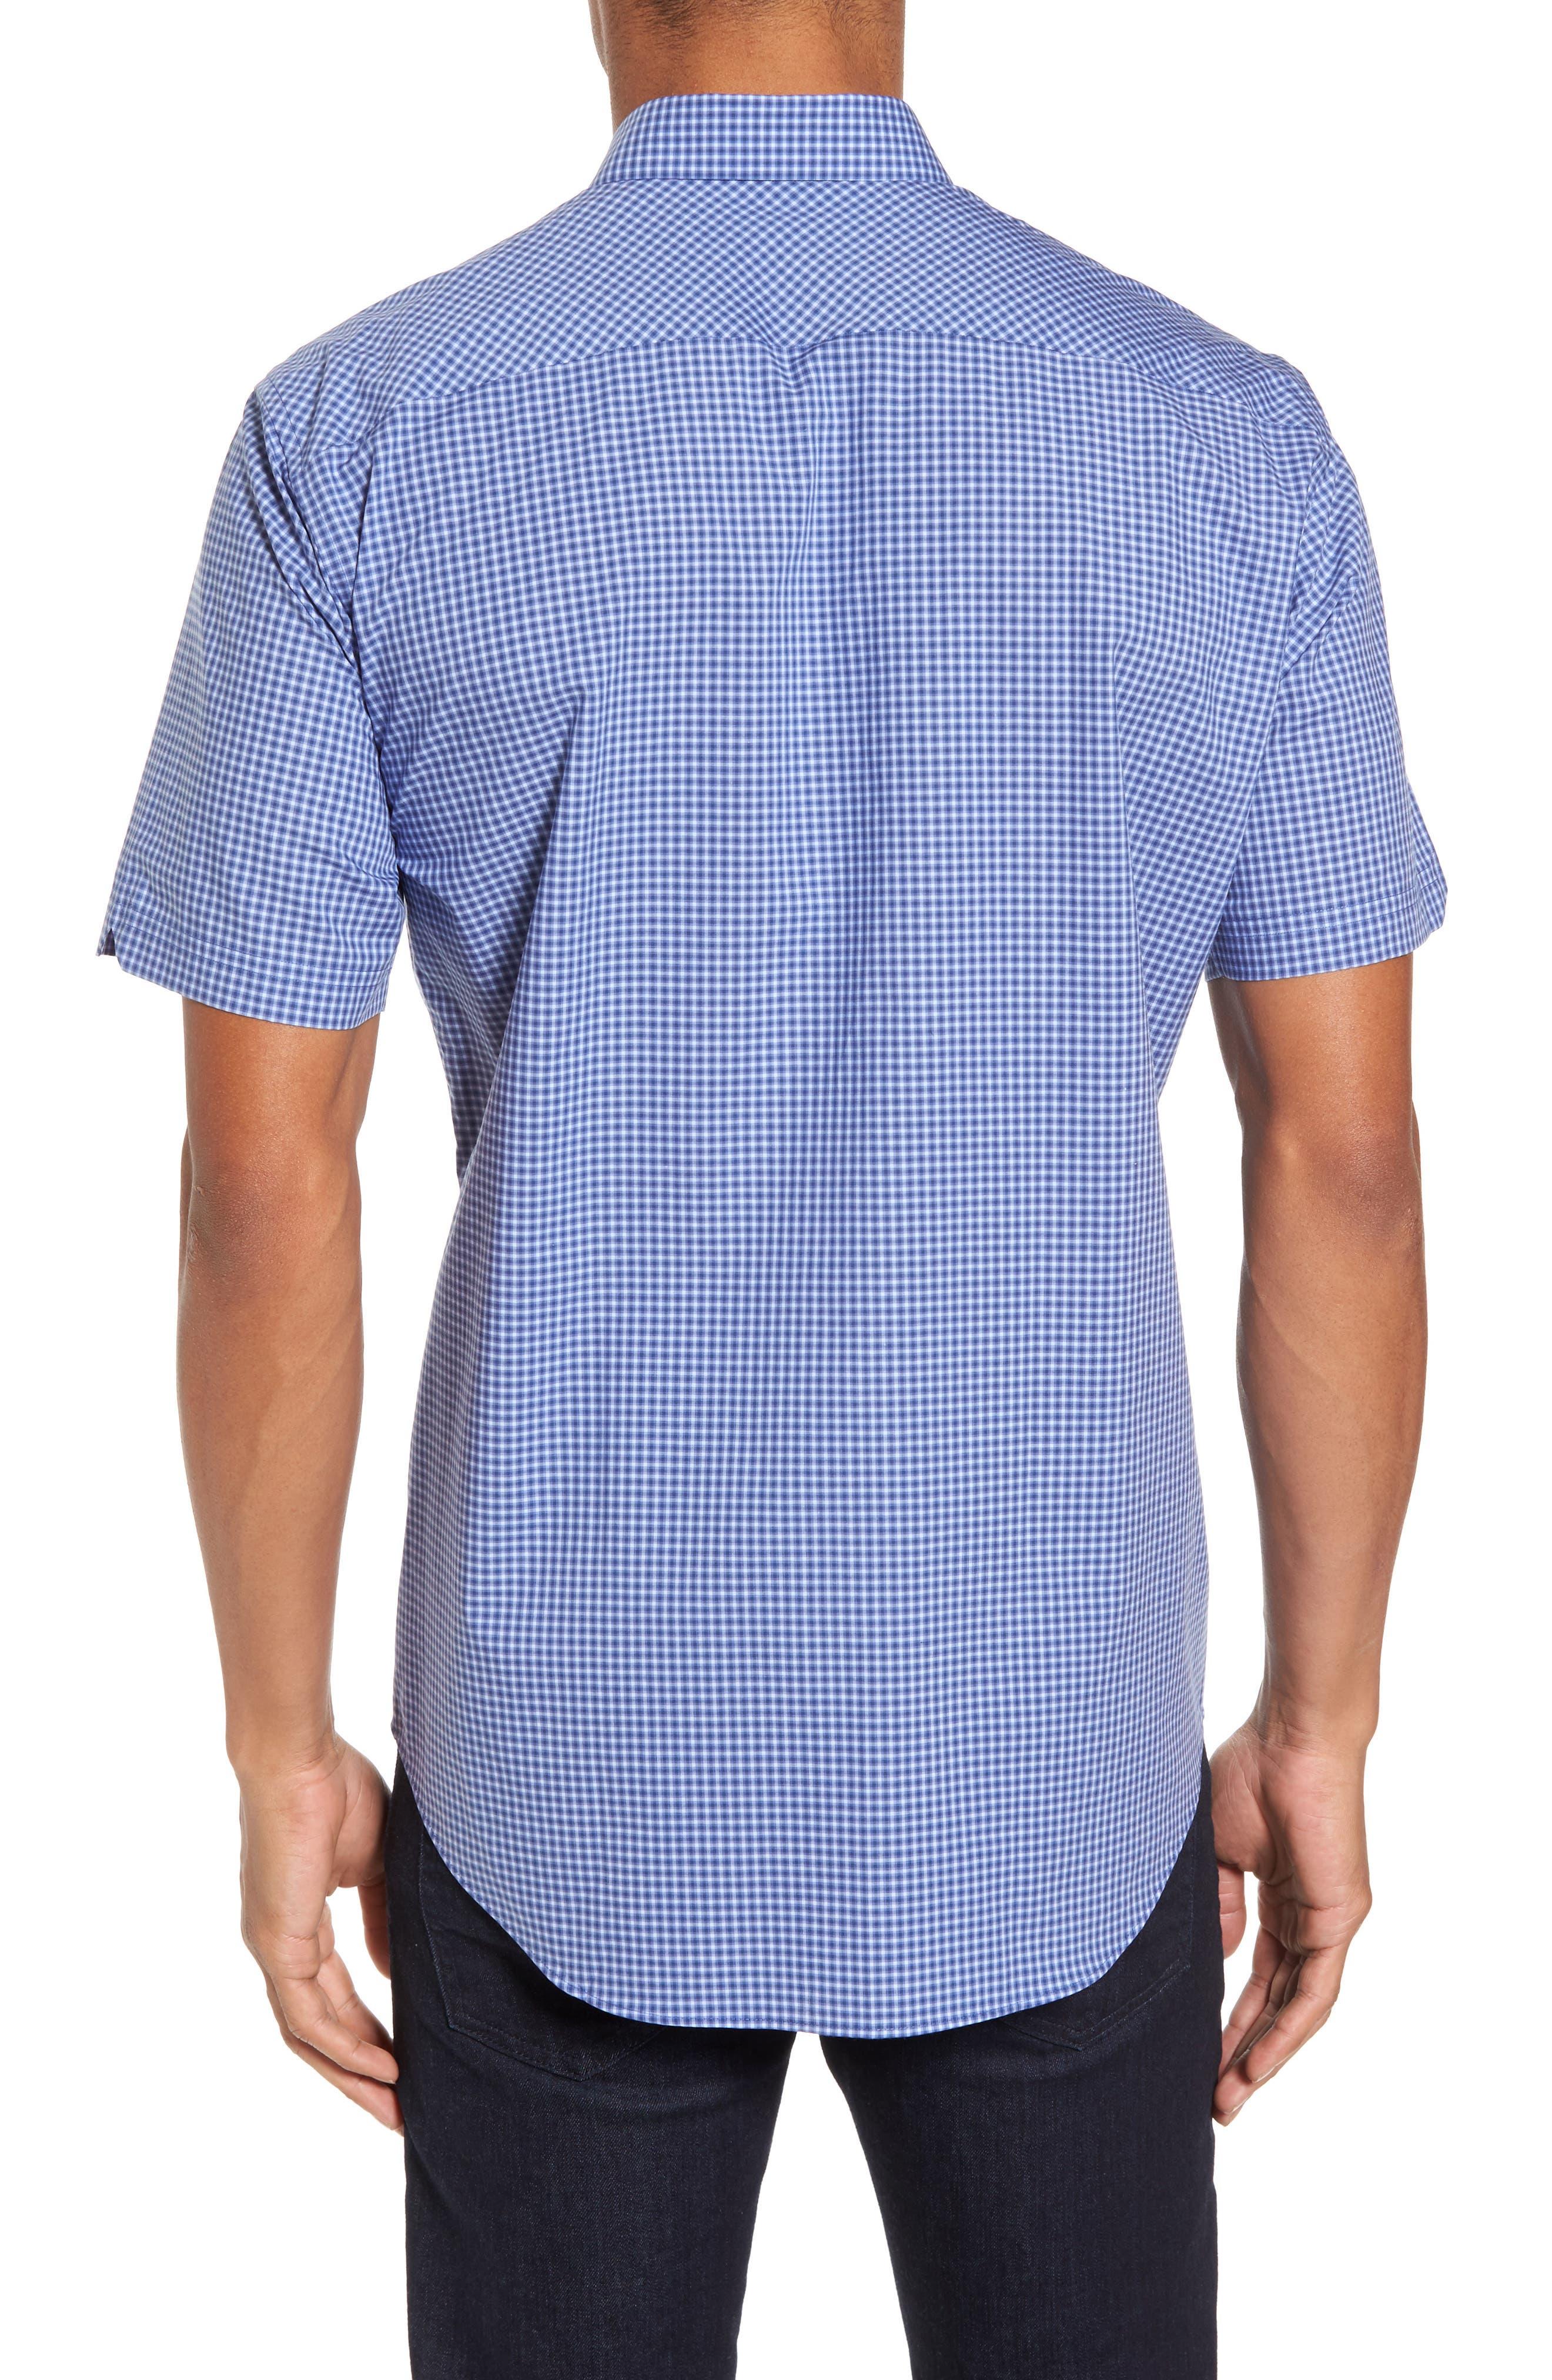 Alternate Image 2  - Zachary Prell Ahmed Slim Fit Plaid Sport Shirt